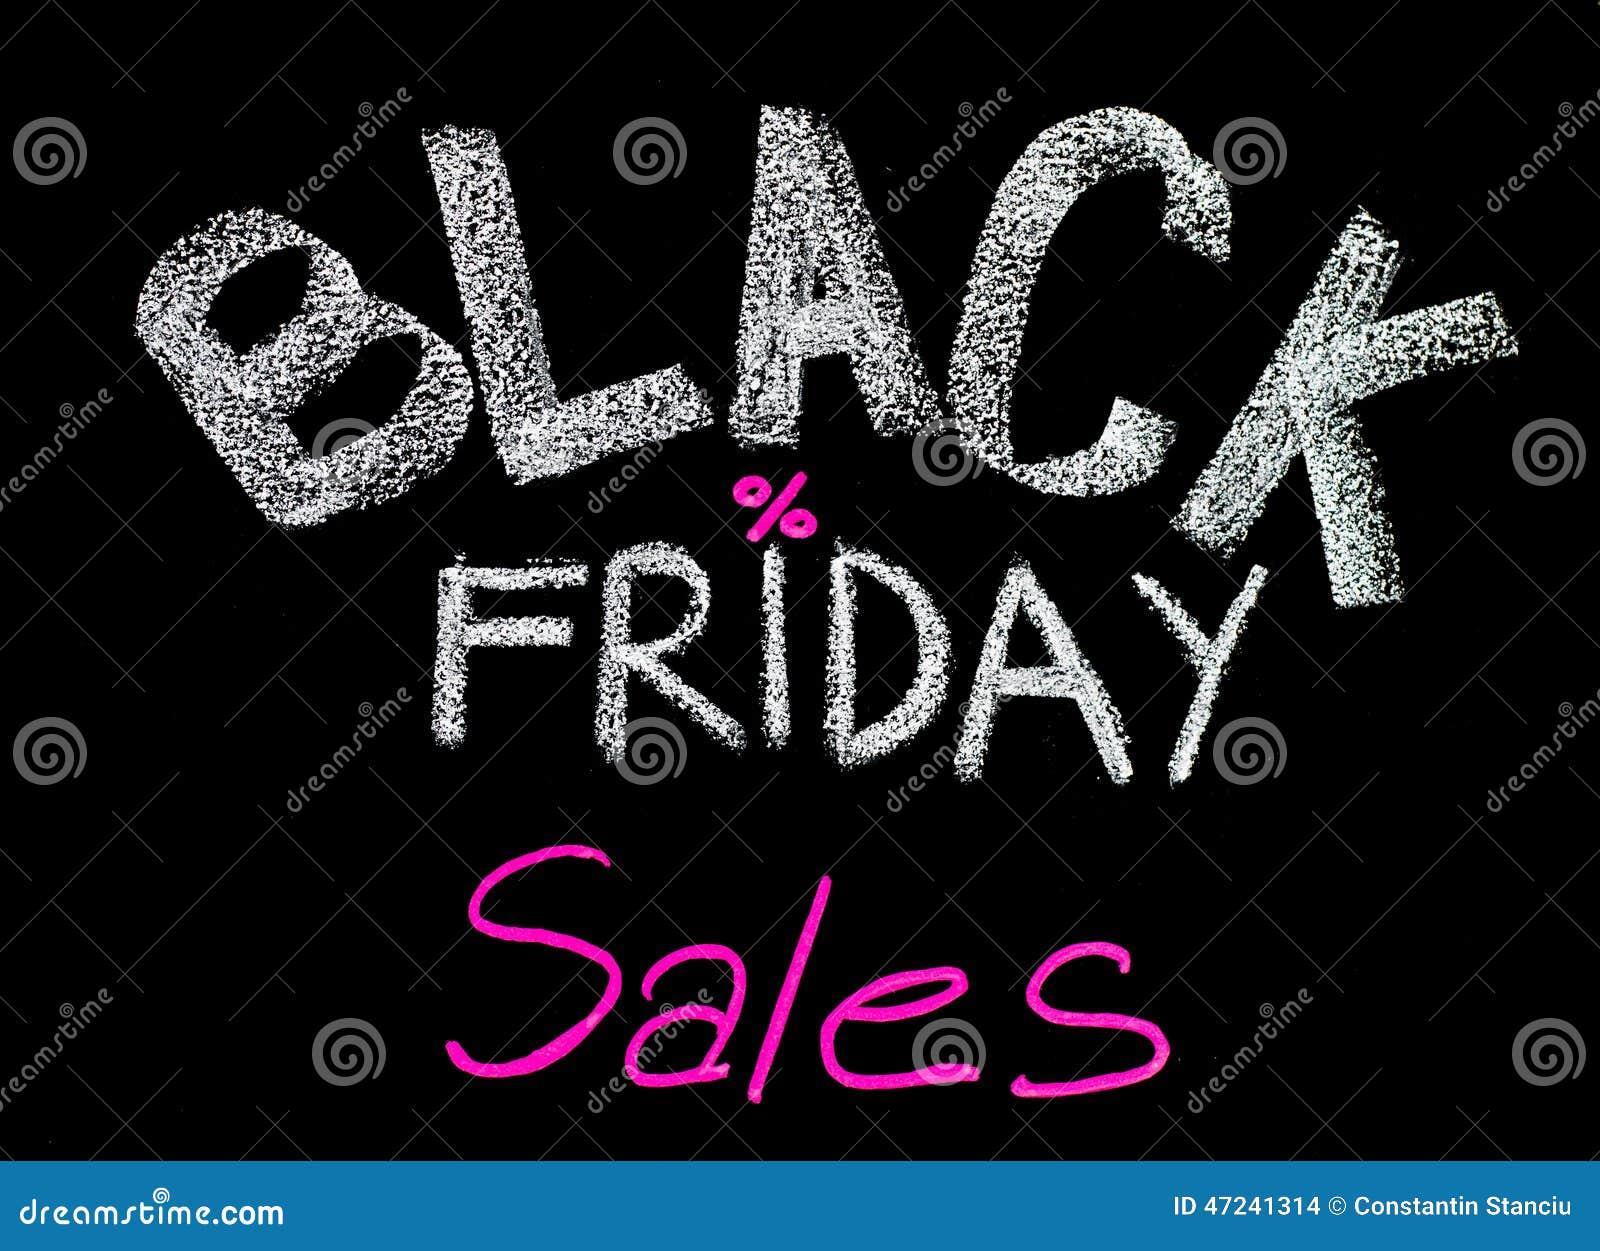 Black Friday Deals Pink >> Black Friday Sales Advertisement Handwritten With Chalk On Blackboard Stock Photo - Image: 47241314